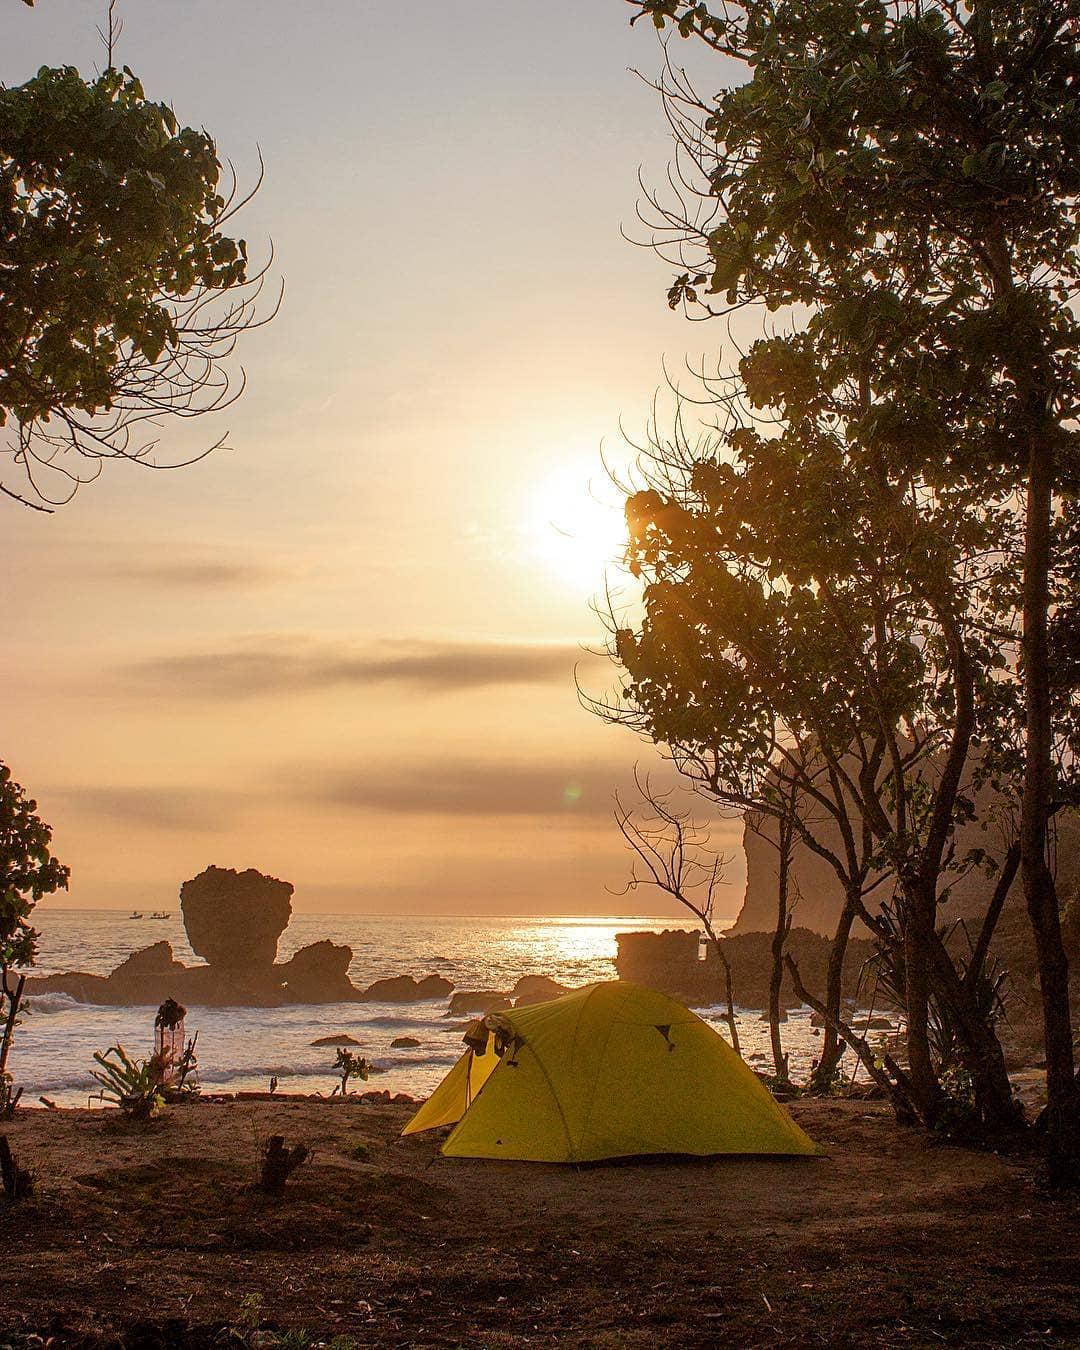 Senja Menguning di Watu Lepek, Malang, Kabupaten Malang, Dolan Dolen, Dolaners Tenangnya Camping di Watu Lepek by bilangagus - Dolan Dolen